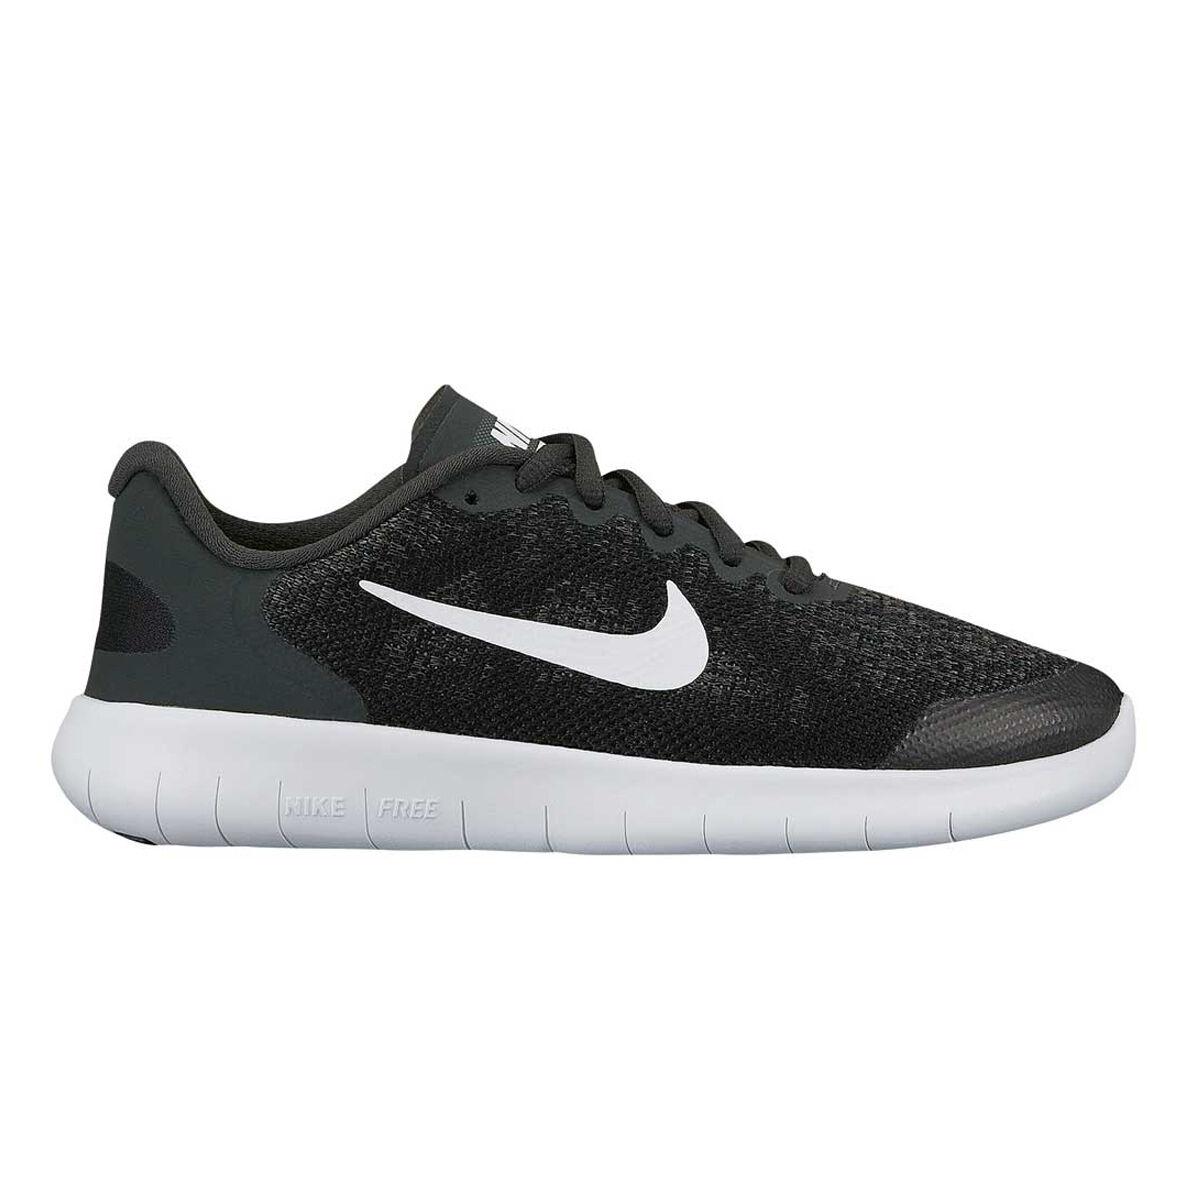 6de85b584fc30 ... promo code for nike free run 2017 boys running shoes rebelhi res 85acc  33ec7 ...